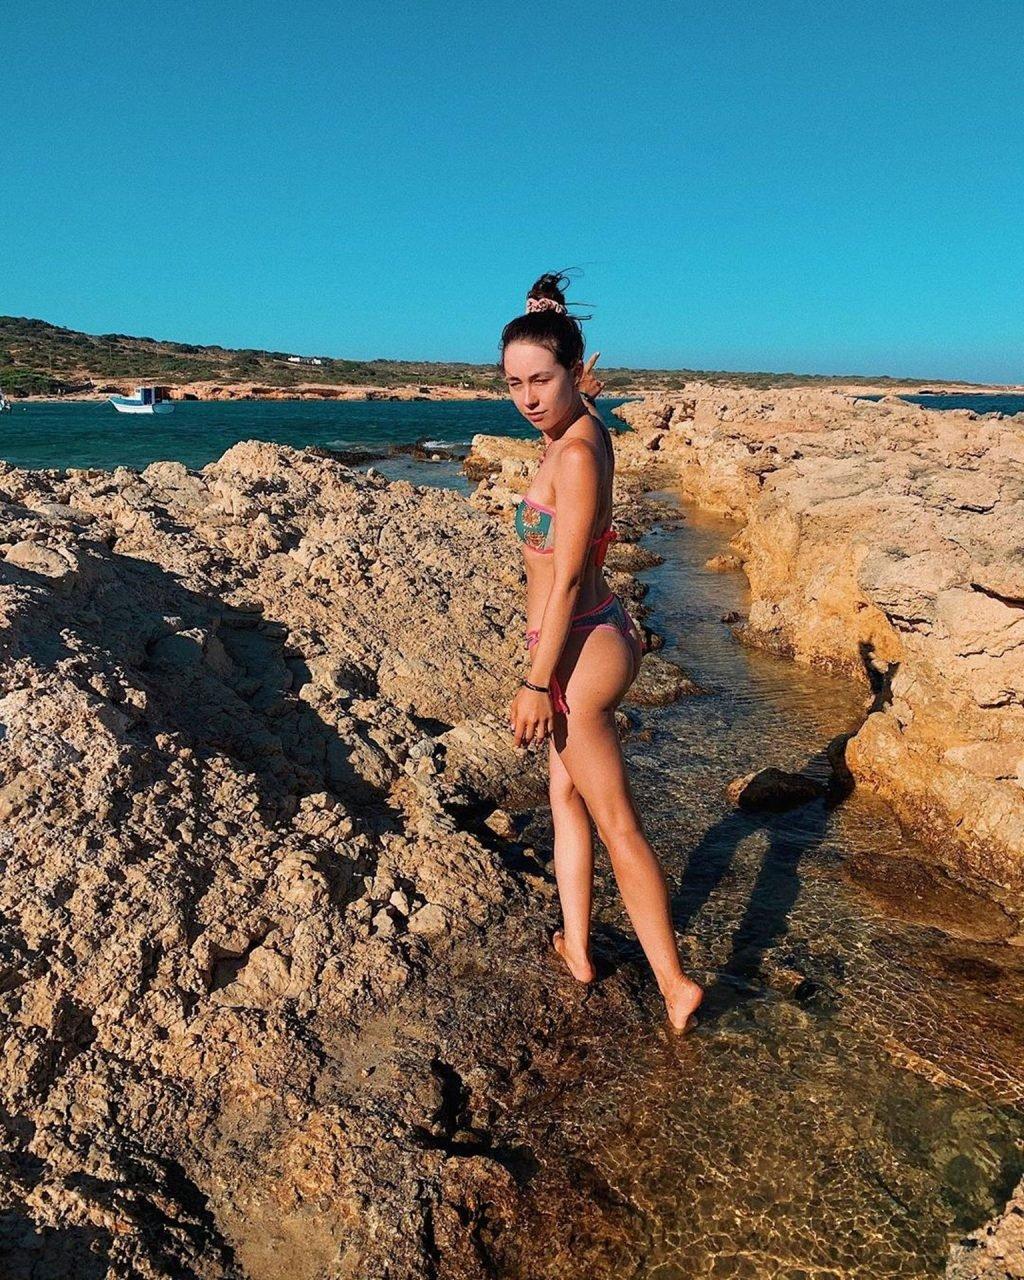 Aurora Ramazzotti Sexy (48 New Photos)